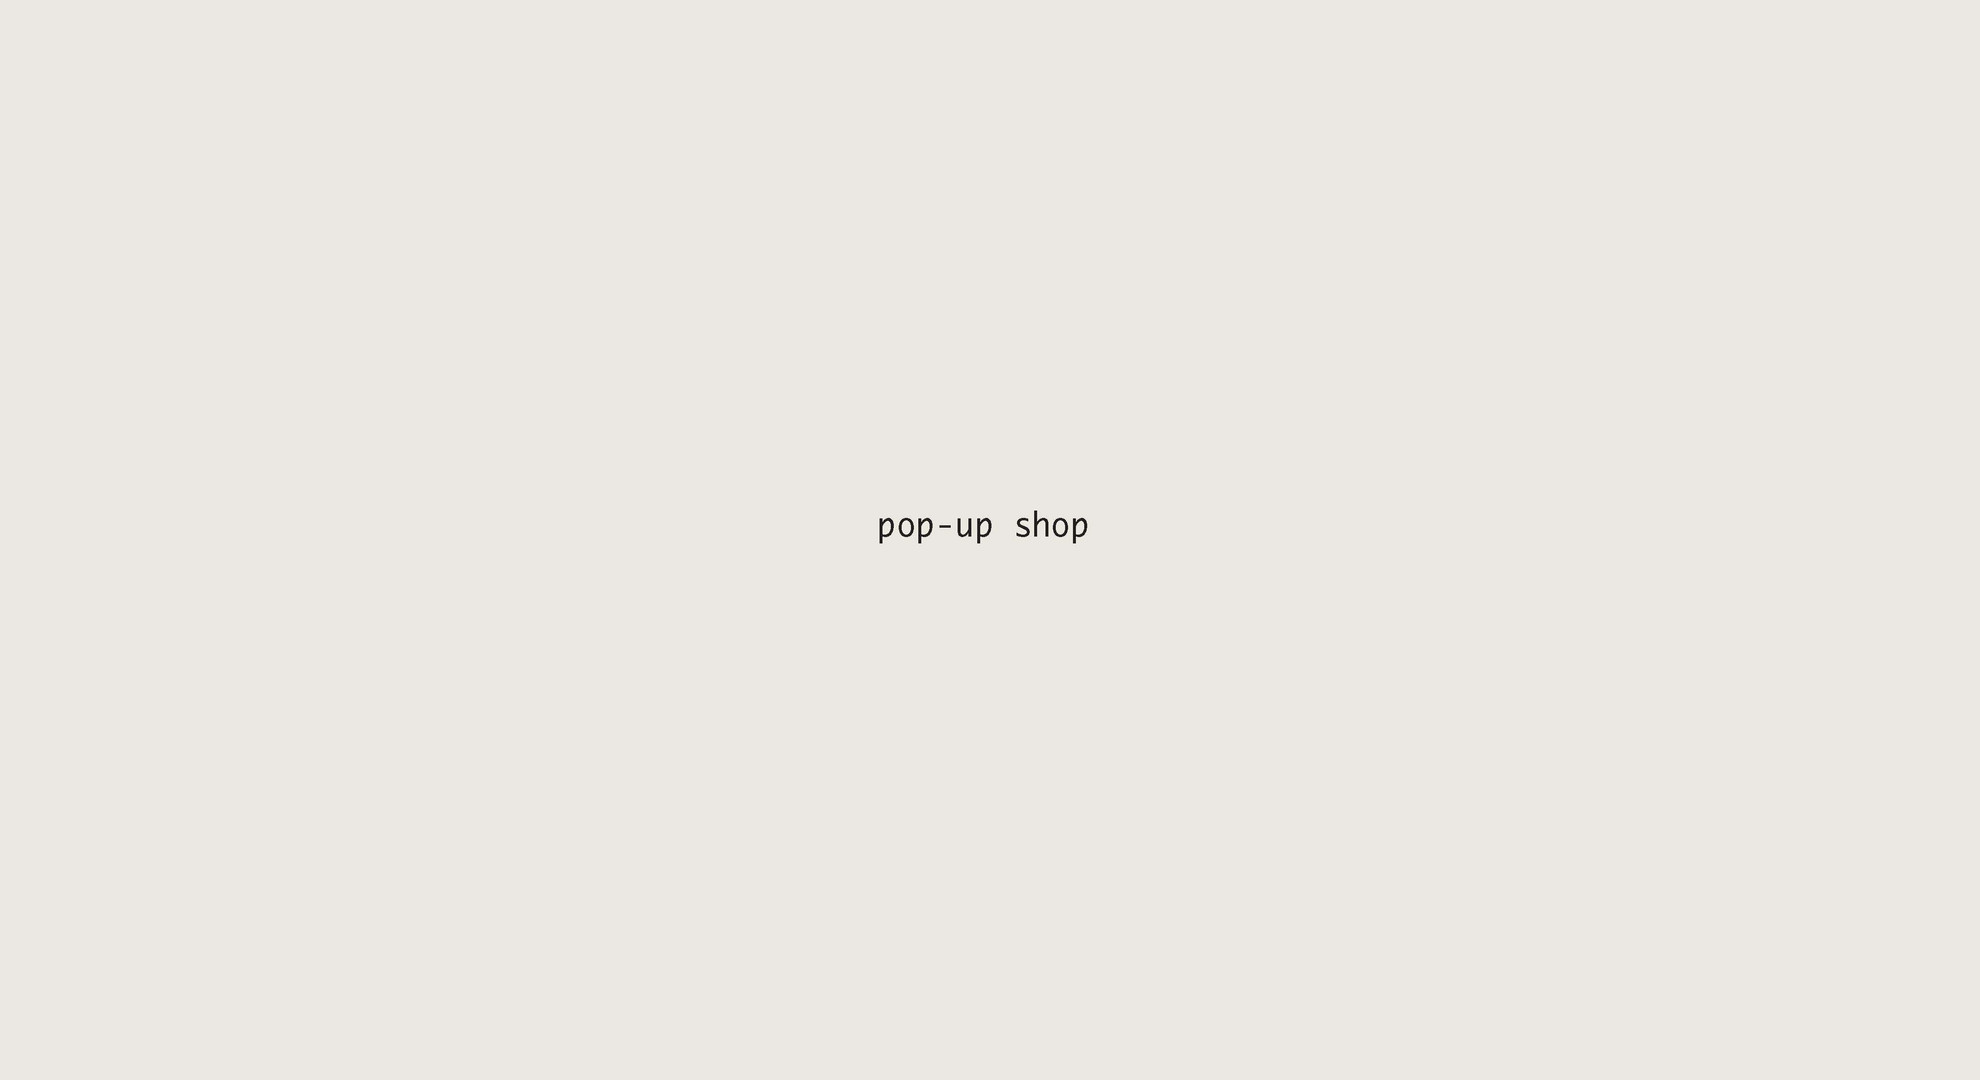 Prose_Pop-up_Page_23.jpg